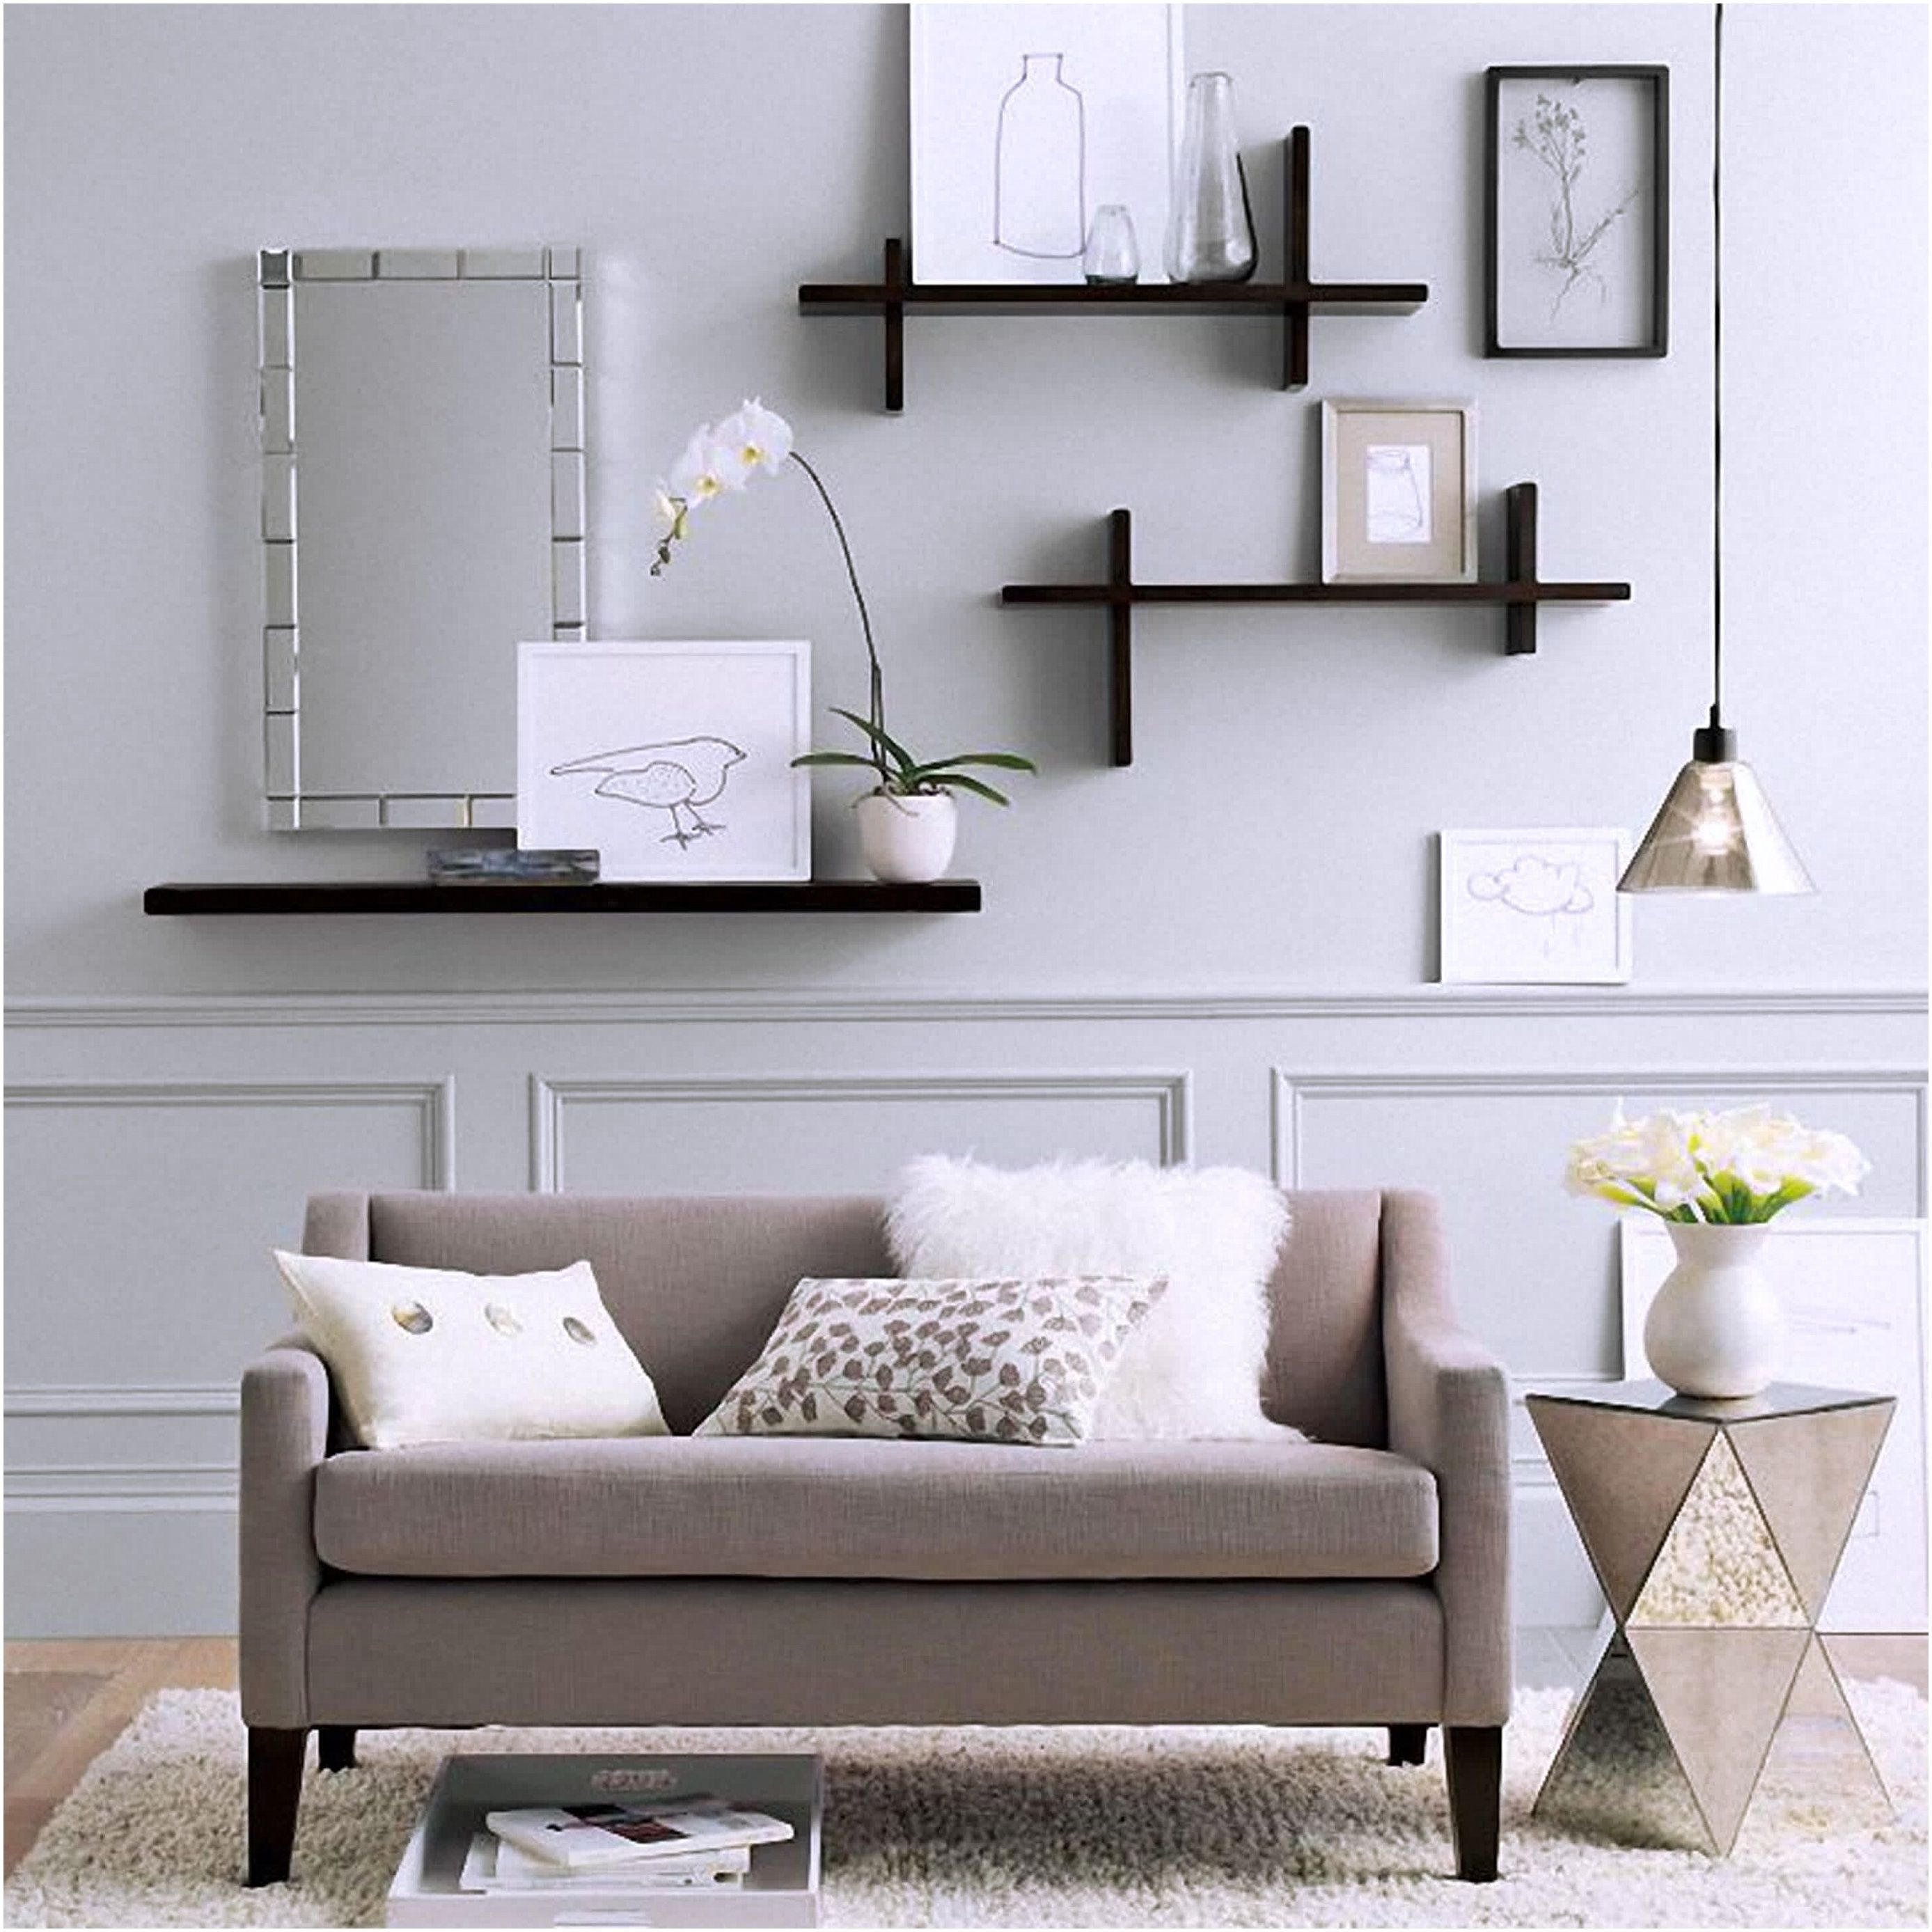 Wall Ledge Shelf Ideas